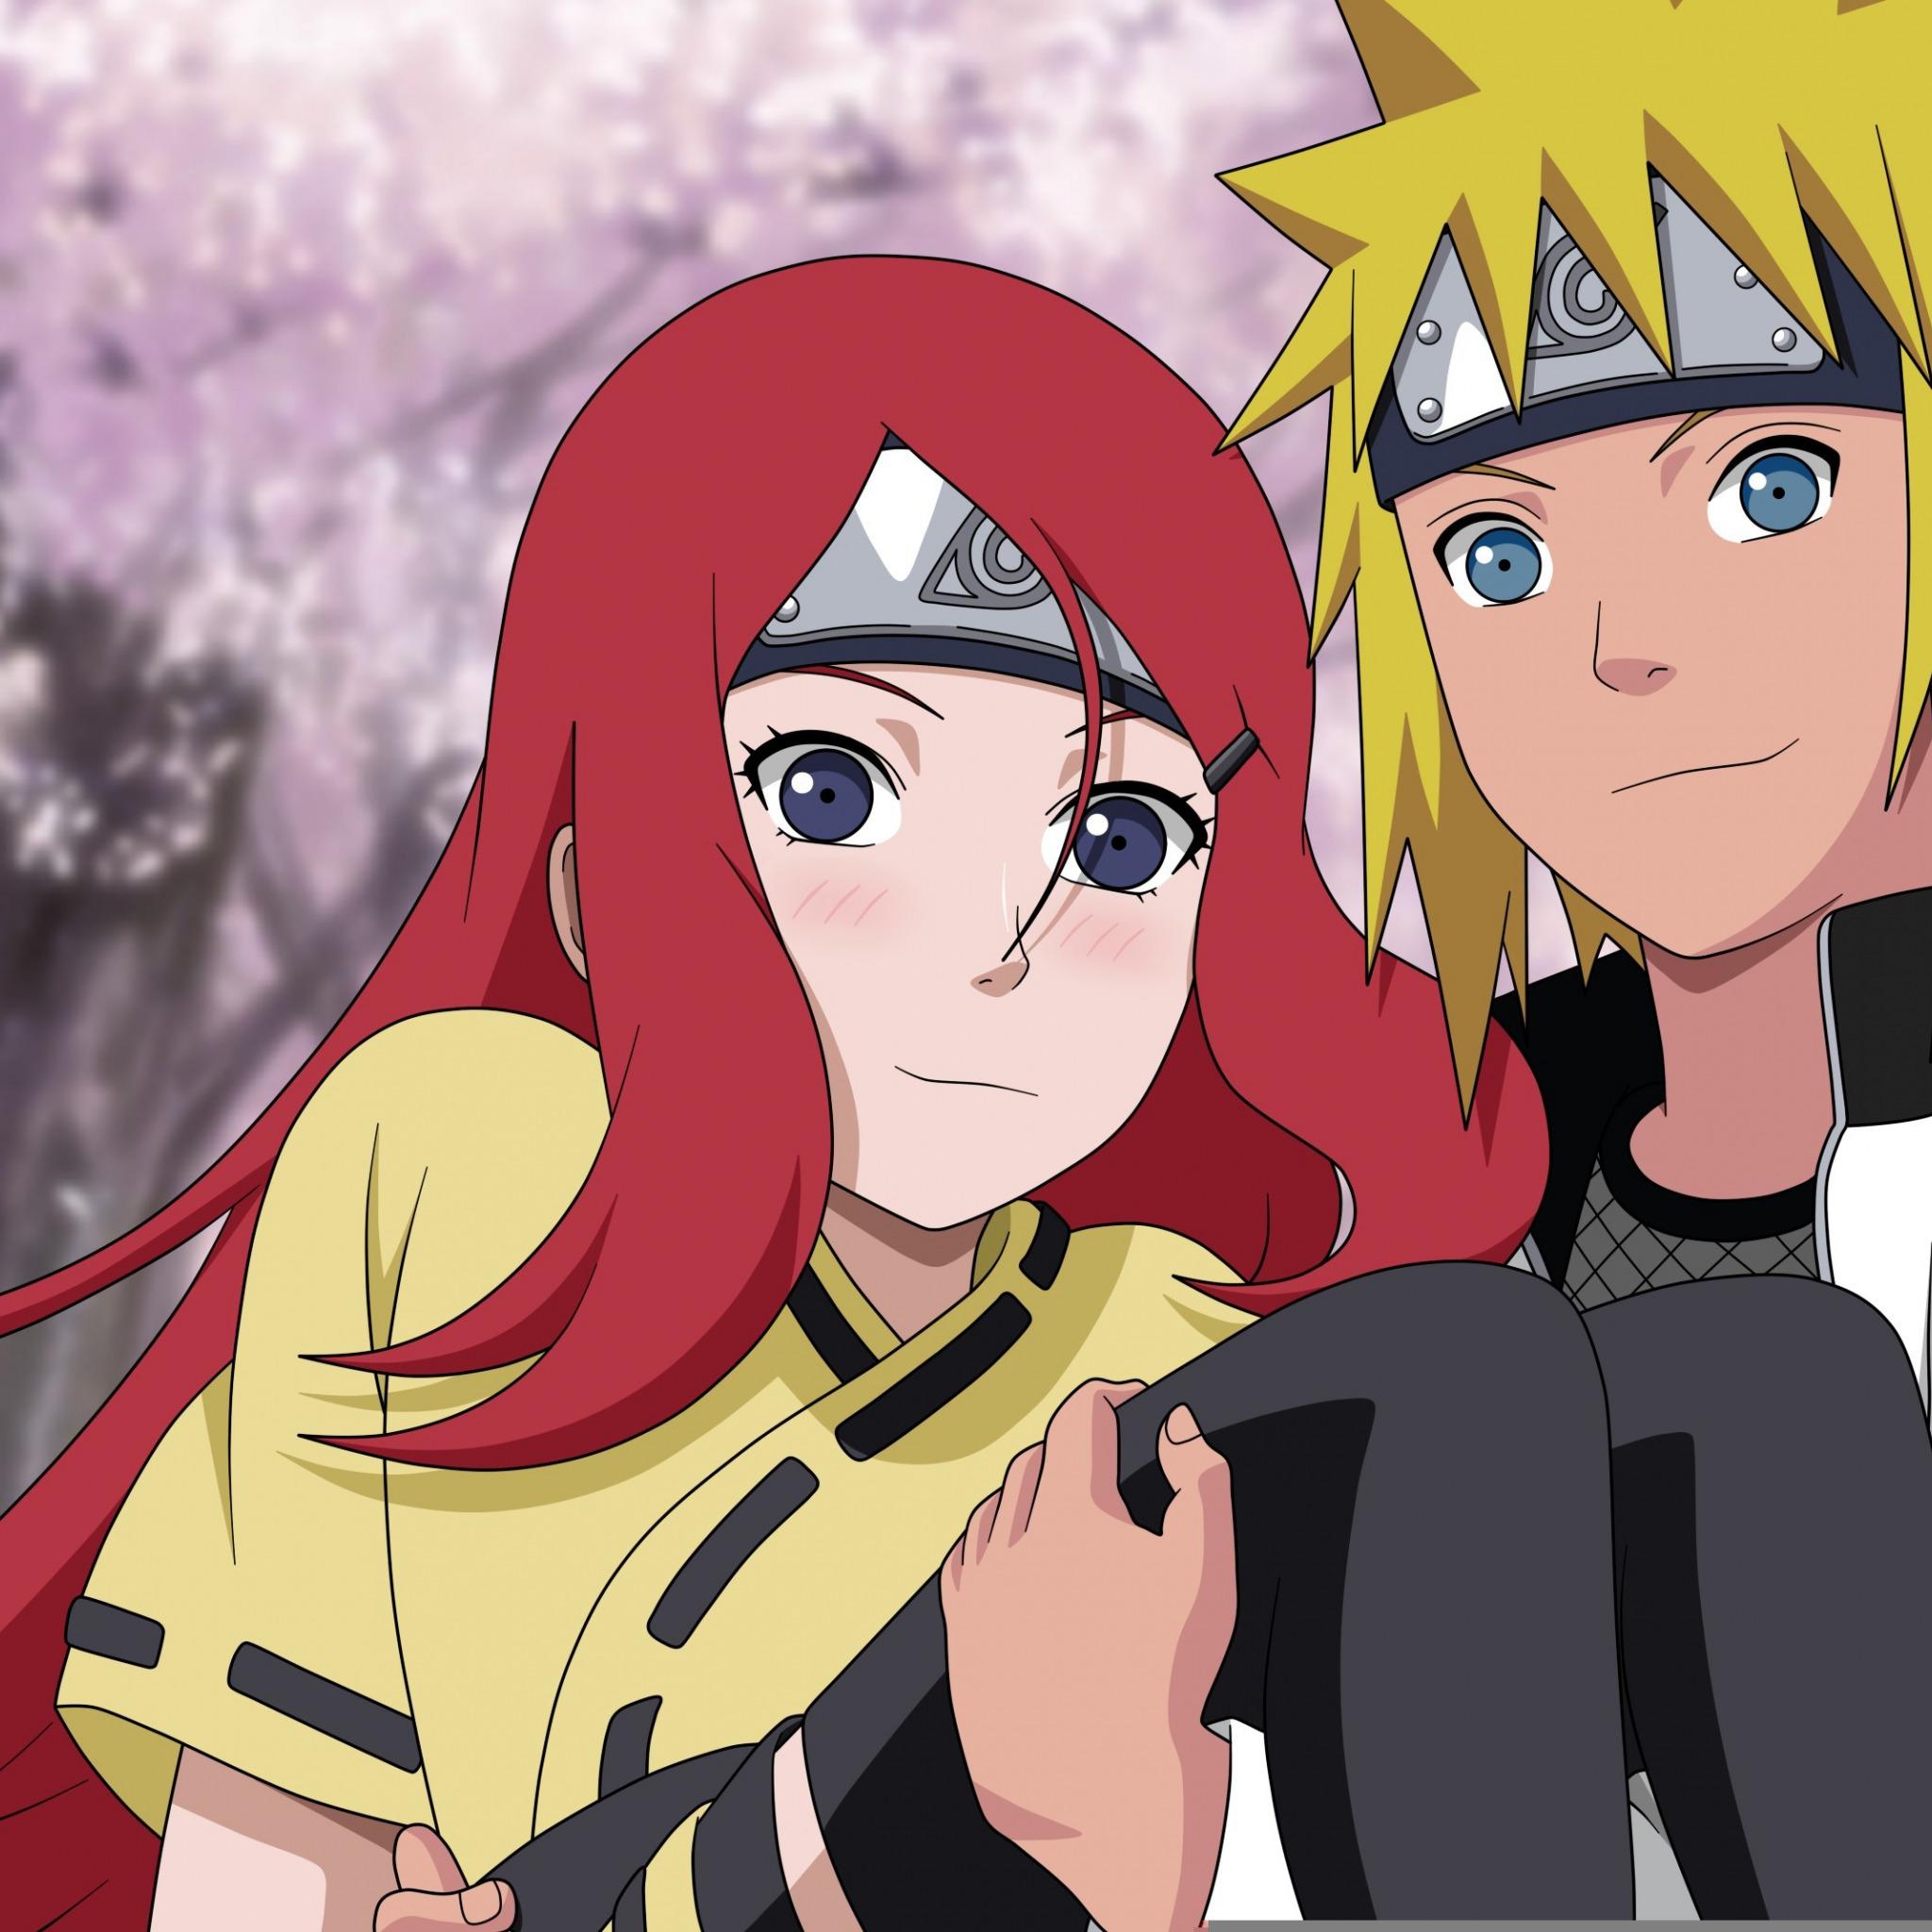 Download Wallpaper Girl Love Red Hair Anime Blue Eyes